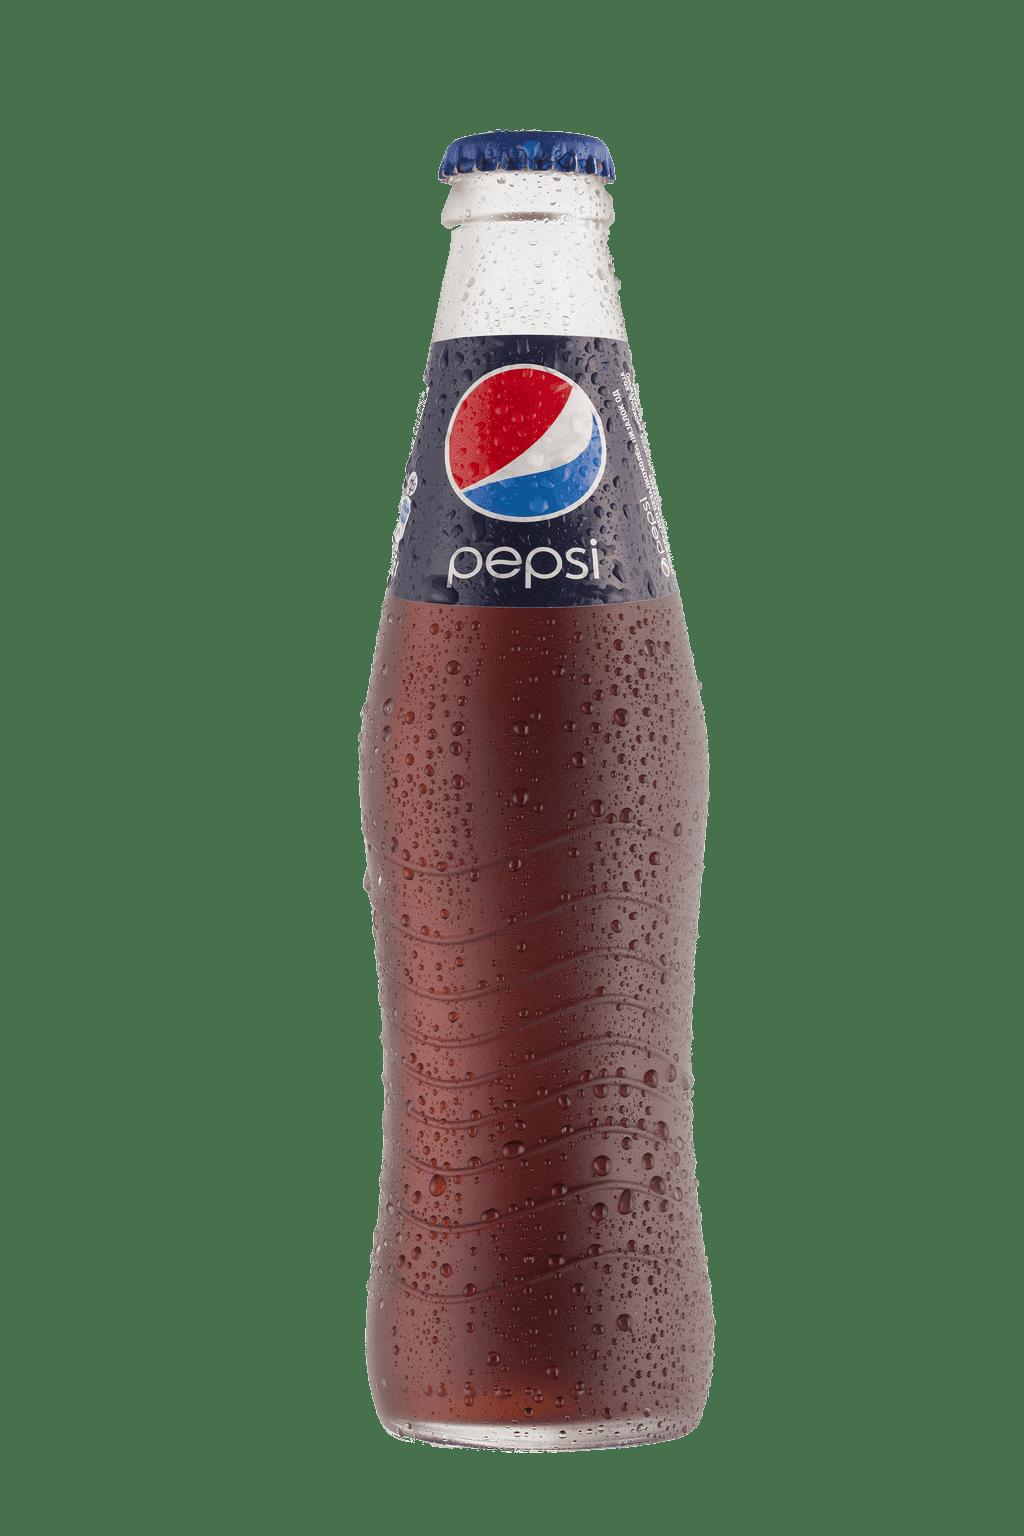 Pepsi Bottle Wet Png Image Pepsi Bottle Pepsi Cola